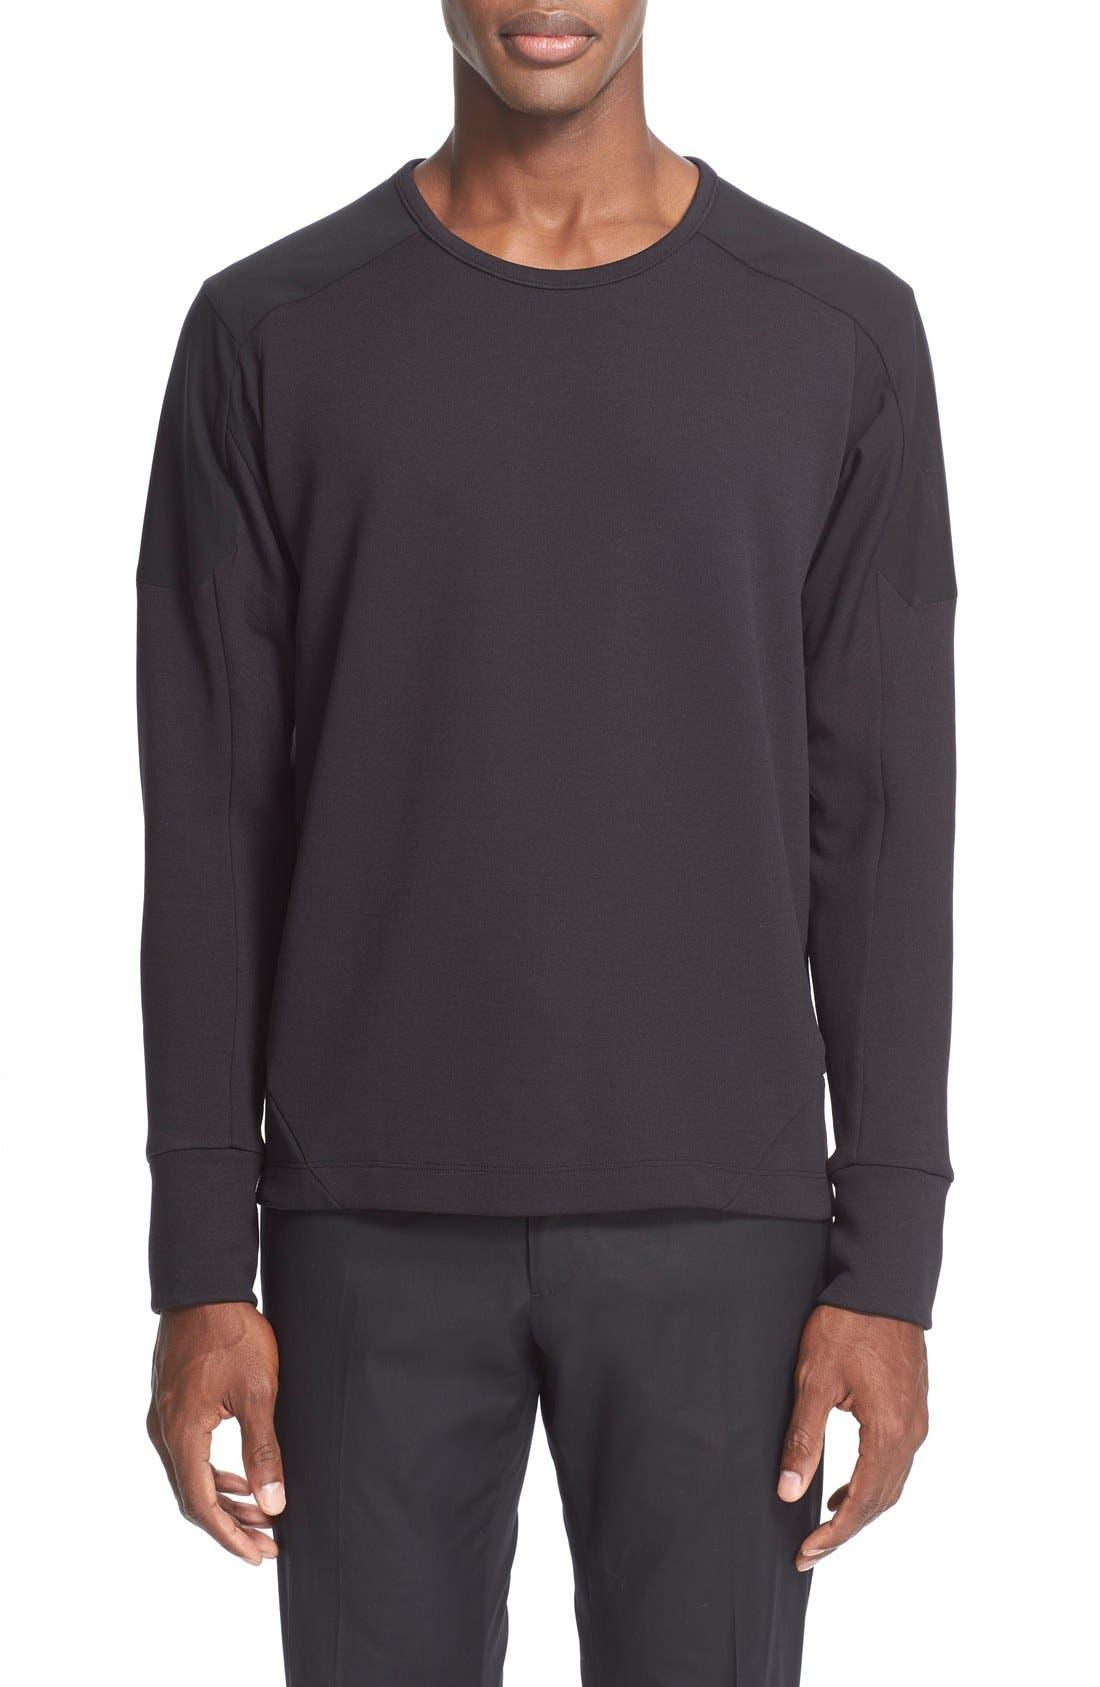 Arc'teryxVeilance'Graph' Sweater,                         Main,                         color, Black